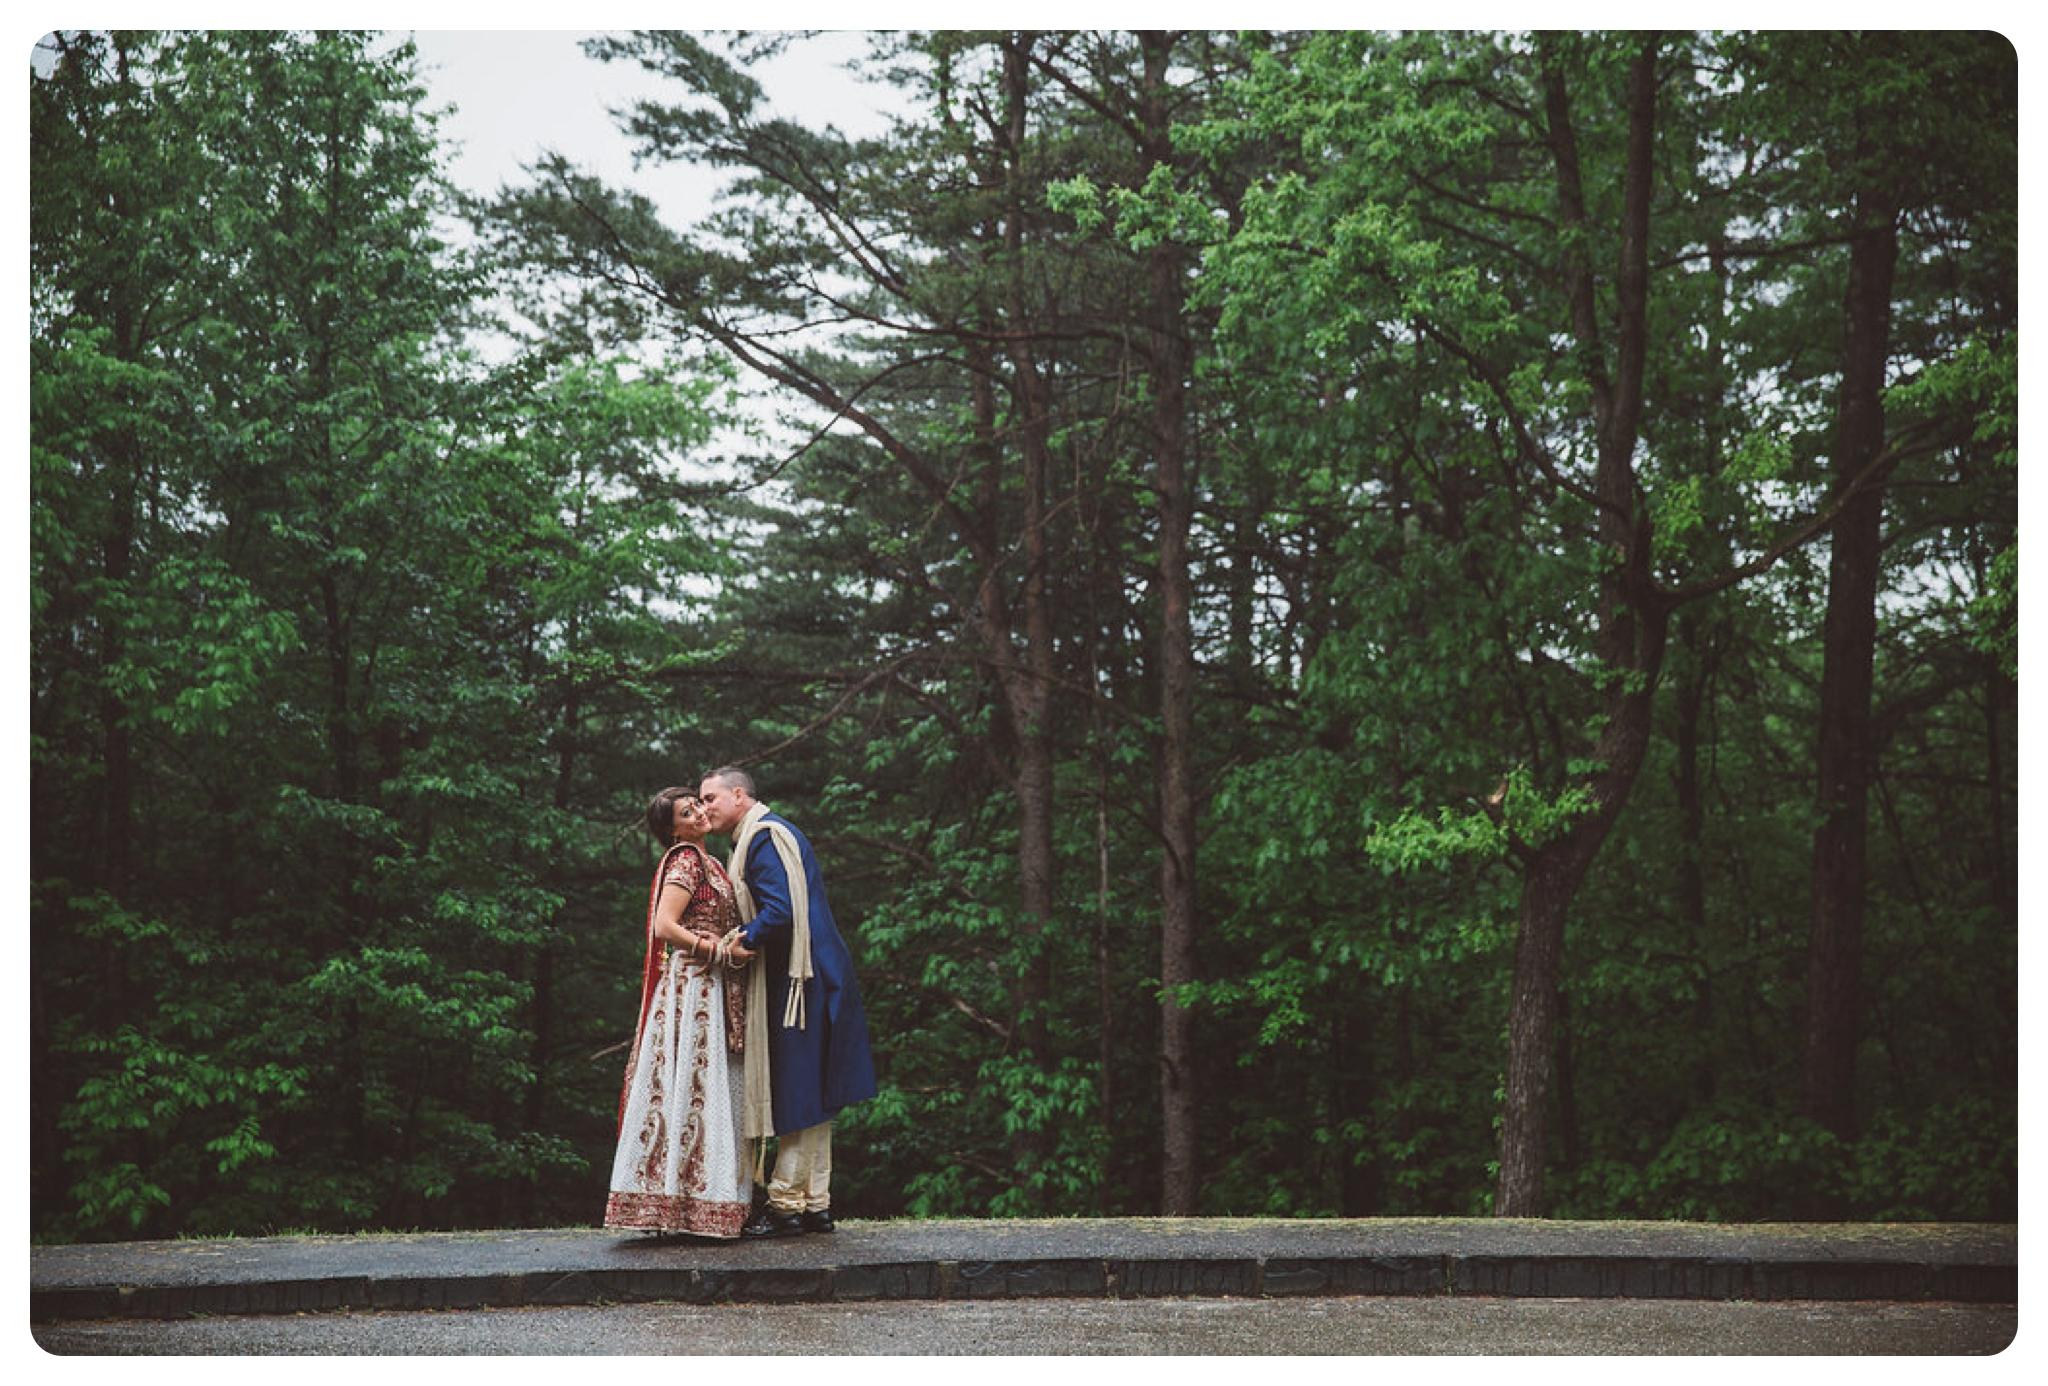 Virginia-Weddings-Center-in-the-Square-Pat-Cori-Photography-029.jpg